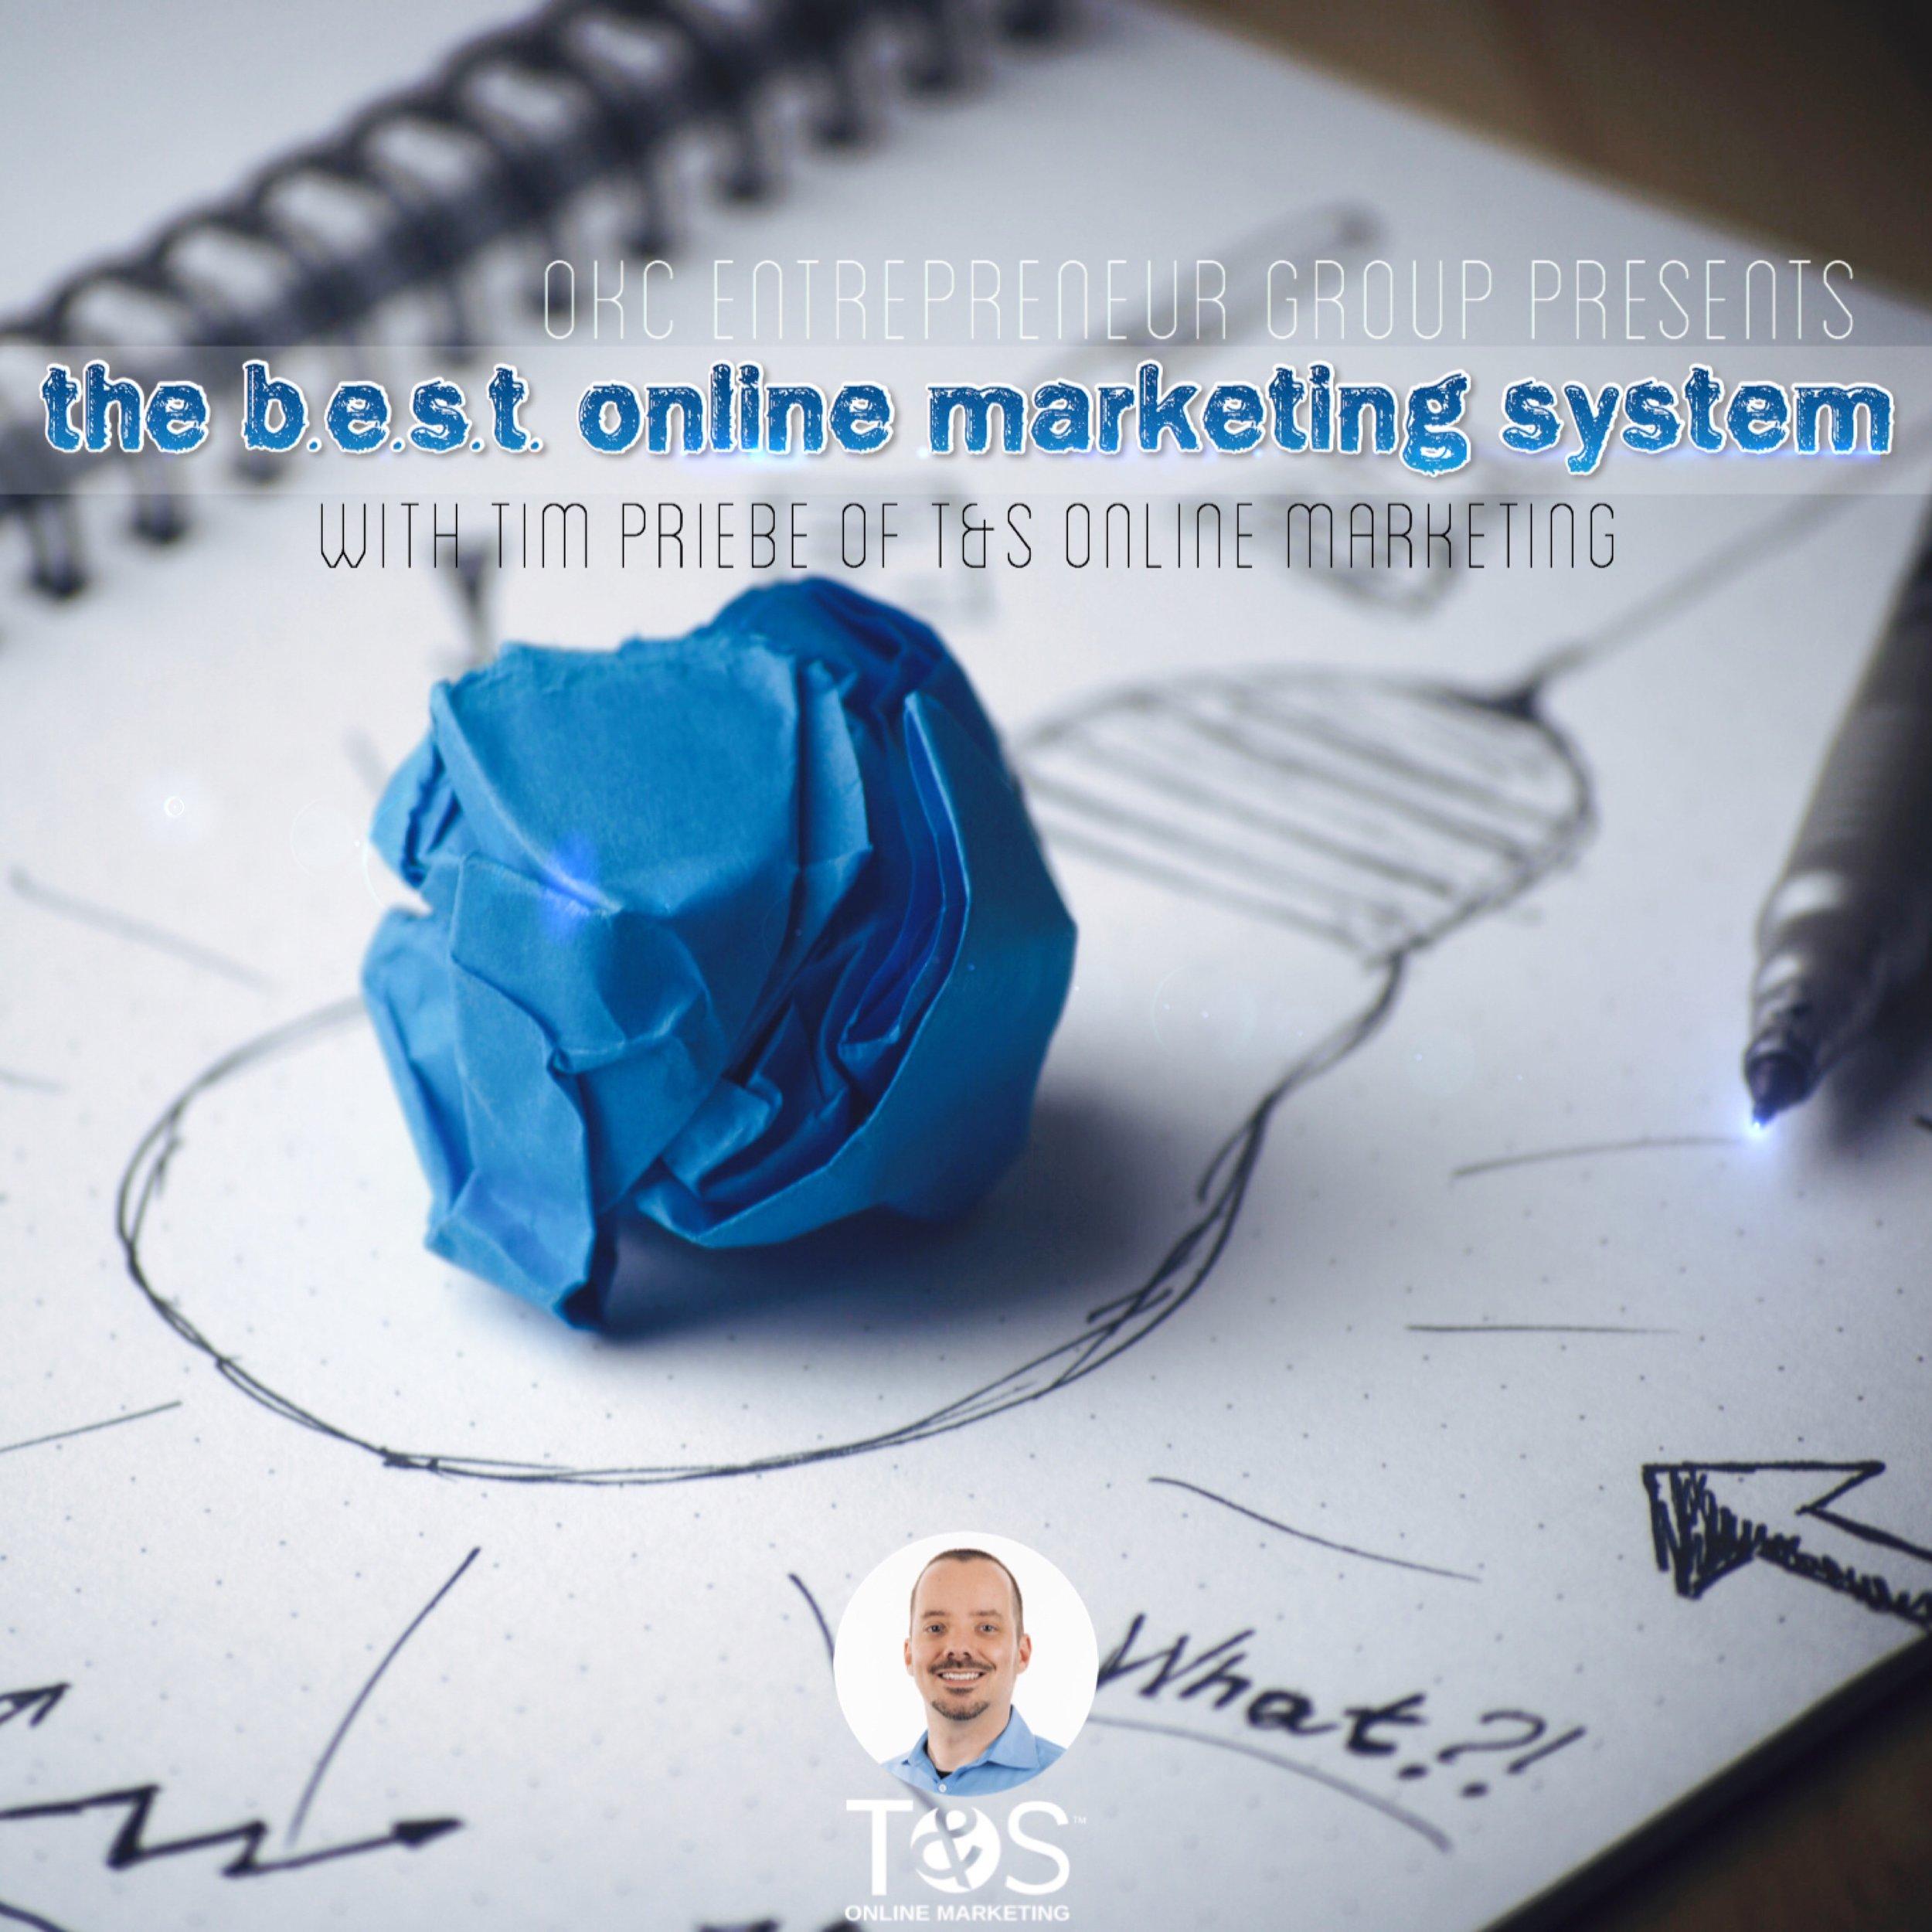 OKCEG Tim Priebe - The B.E.S.T. Online Marketing System.jpg.jpg